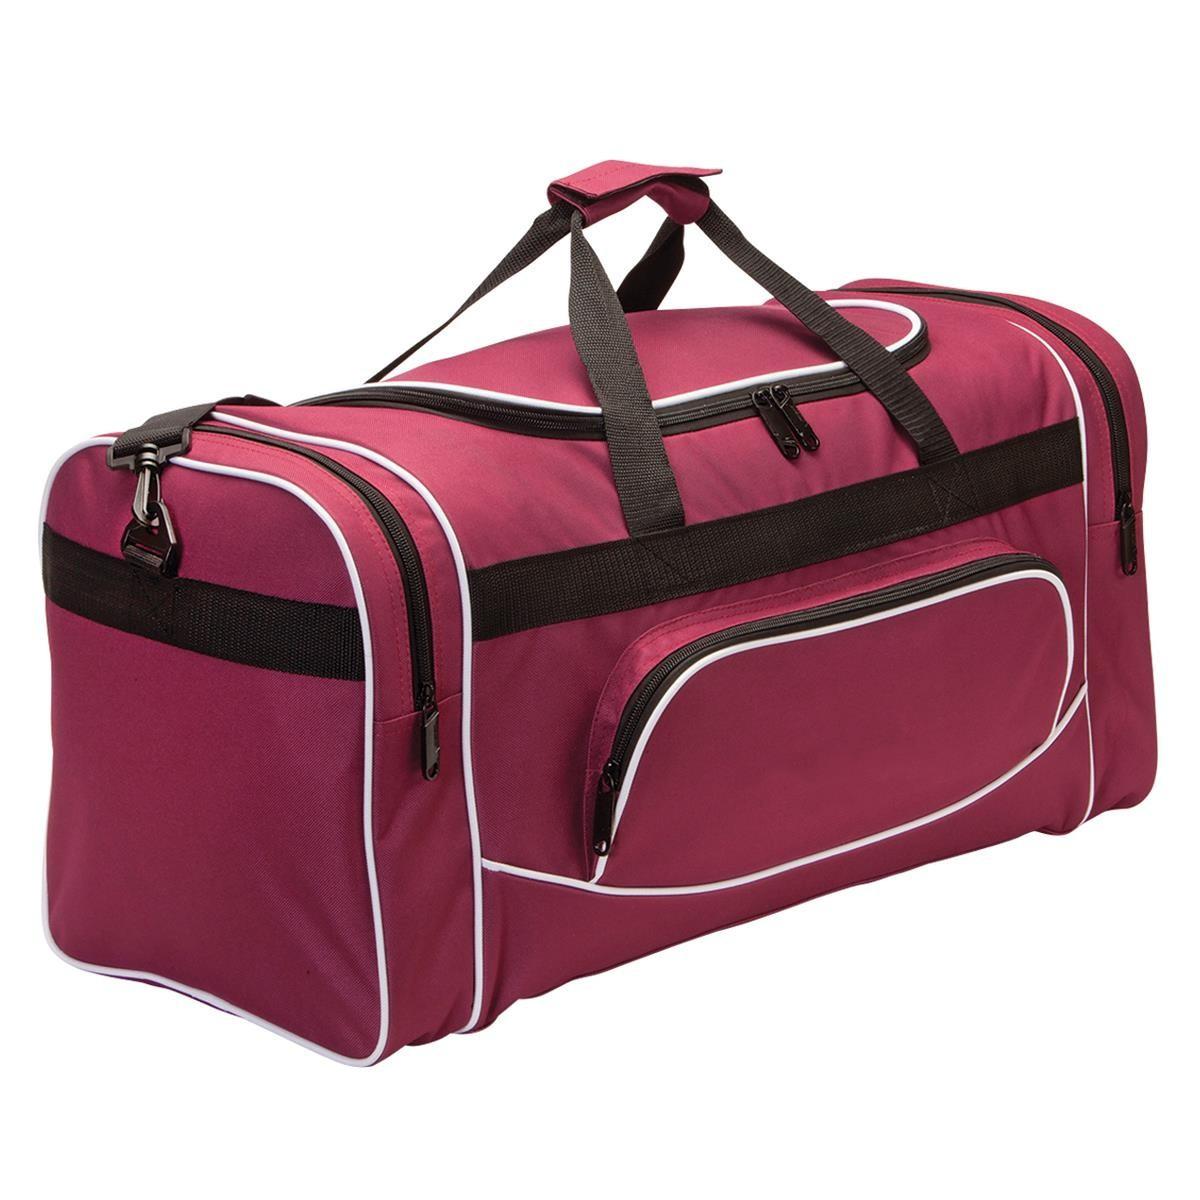 Ranger Sports Bag - Maroon